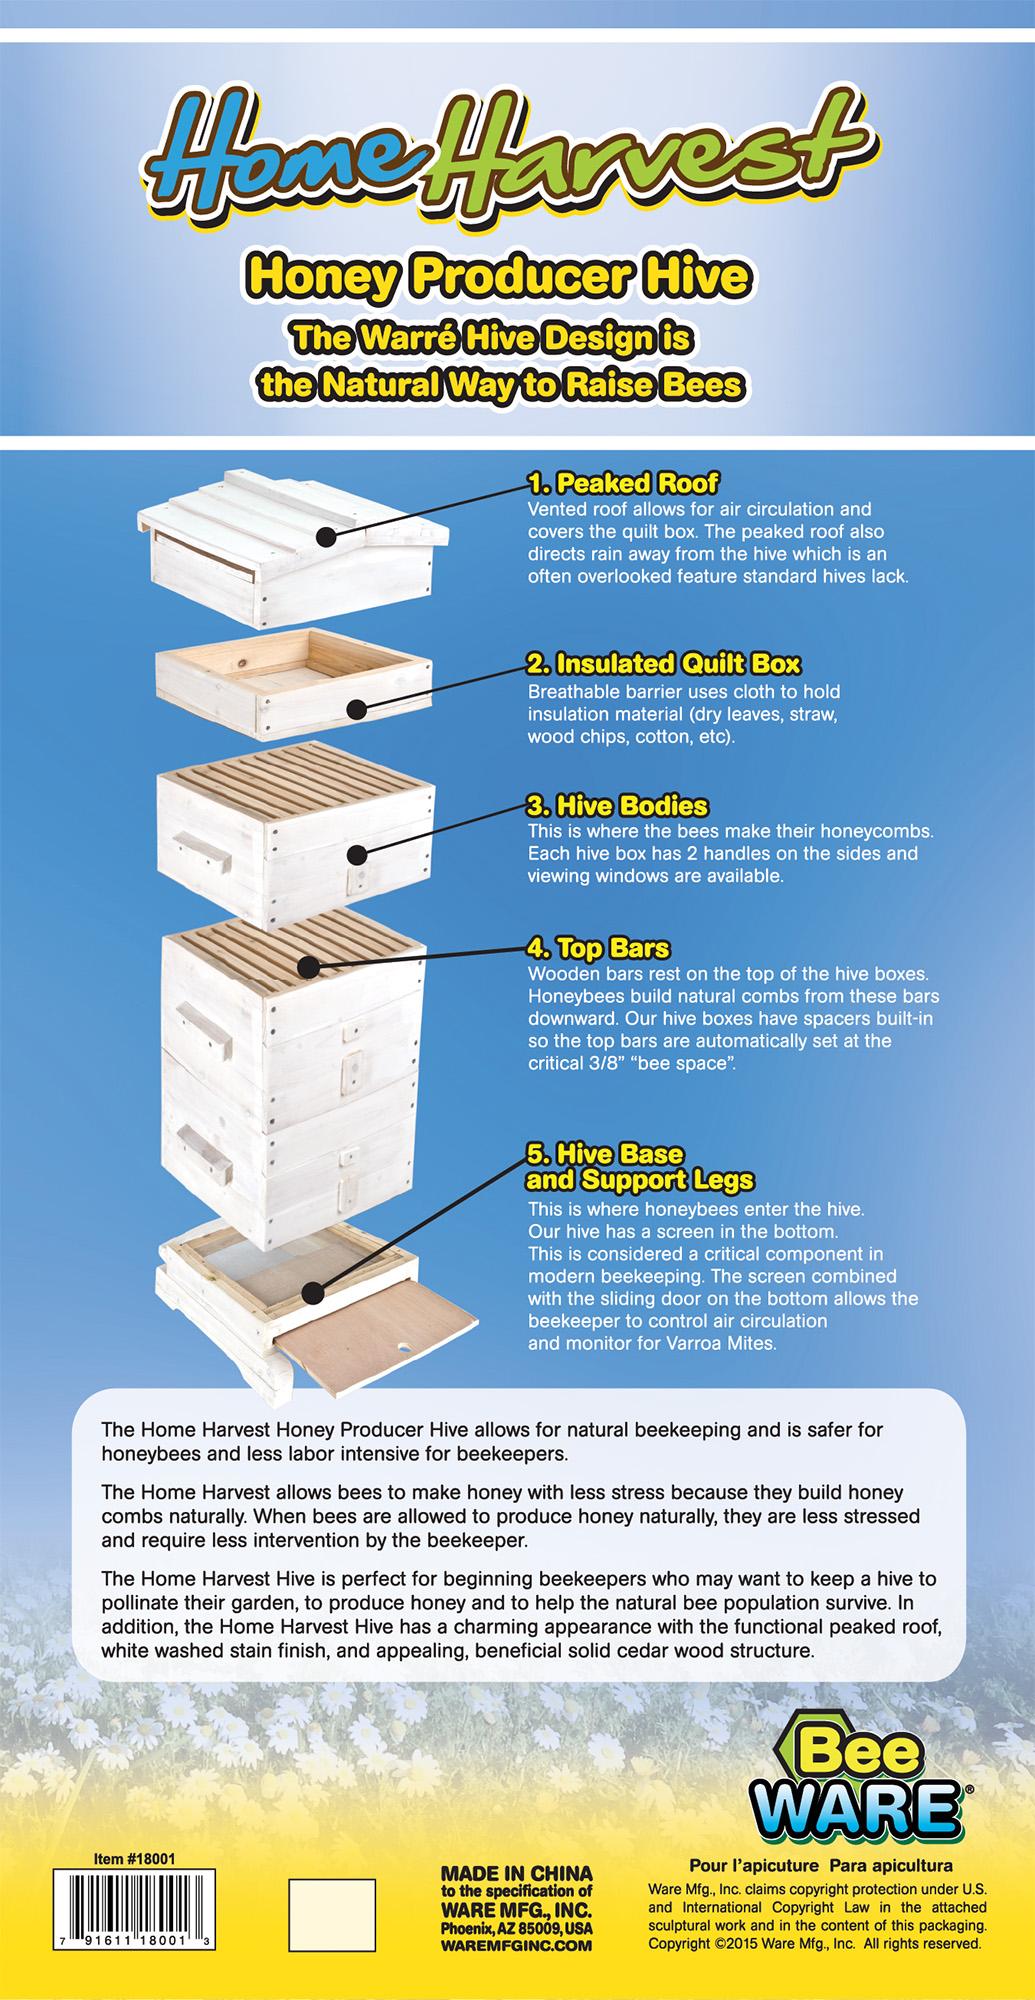 Home Harvest Hive